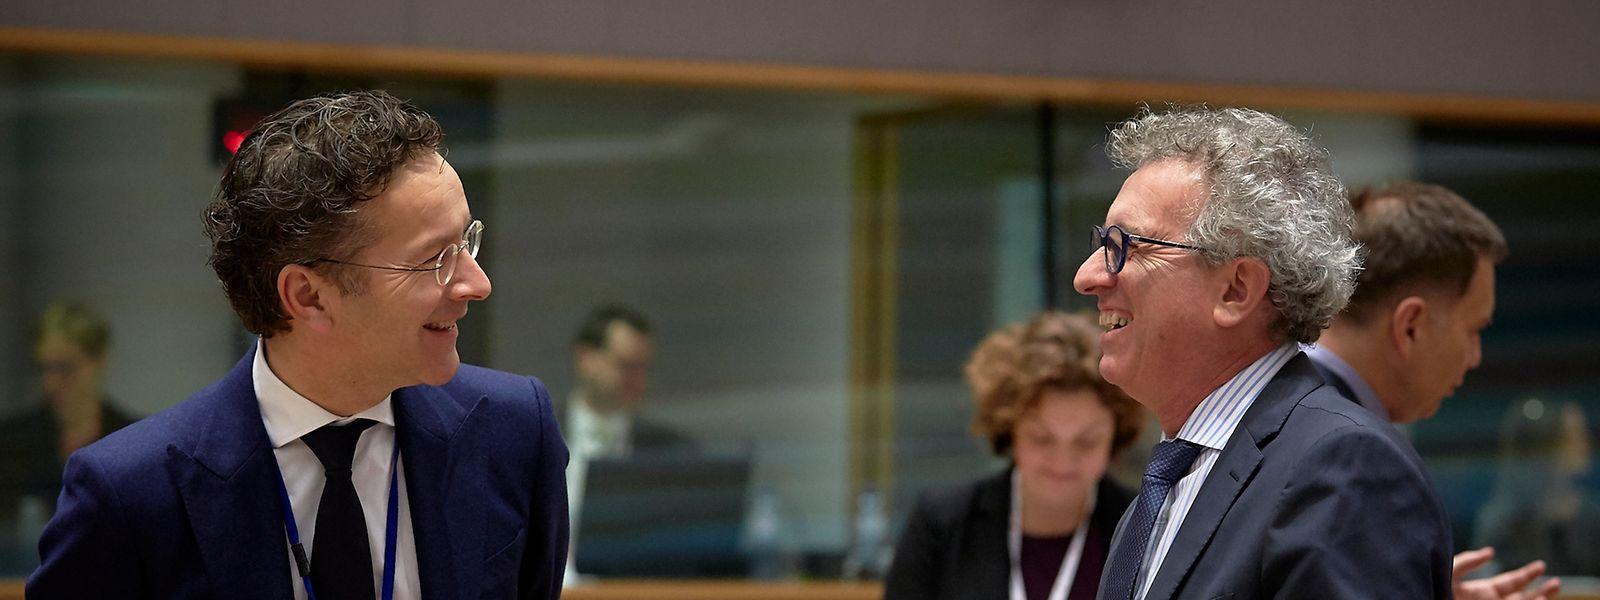 Jeroen Dijsselbloem und Pierre Gramegna, 5.12.2017 in Brüssel.